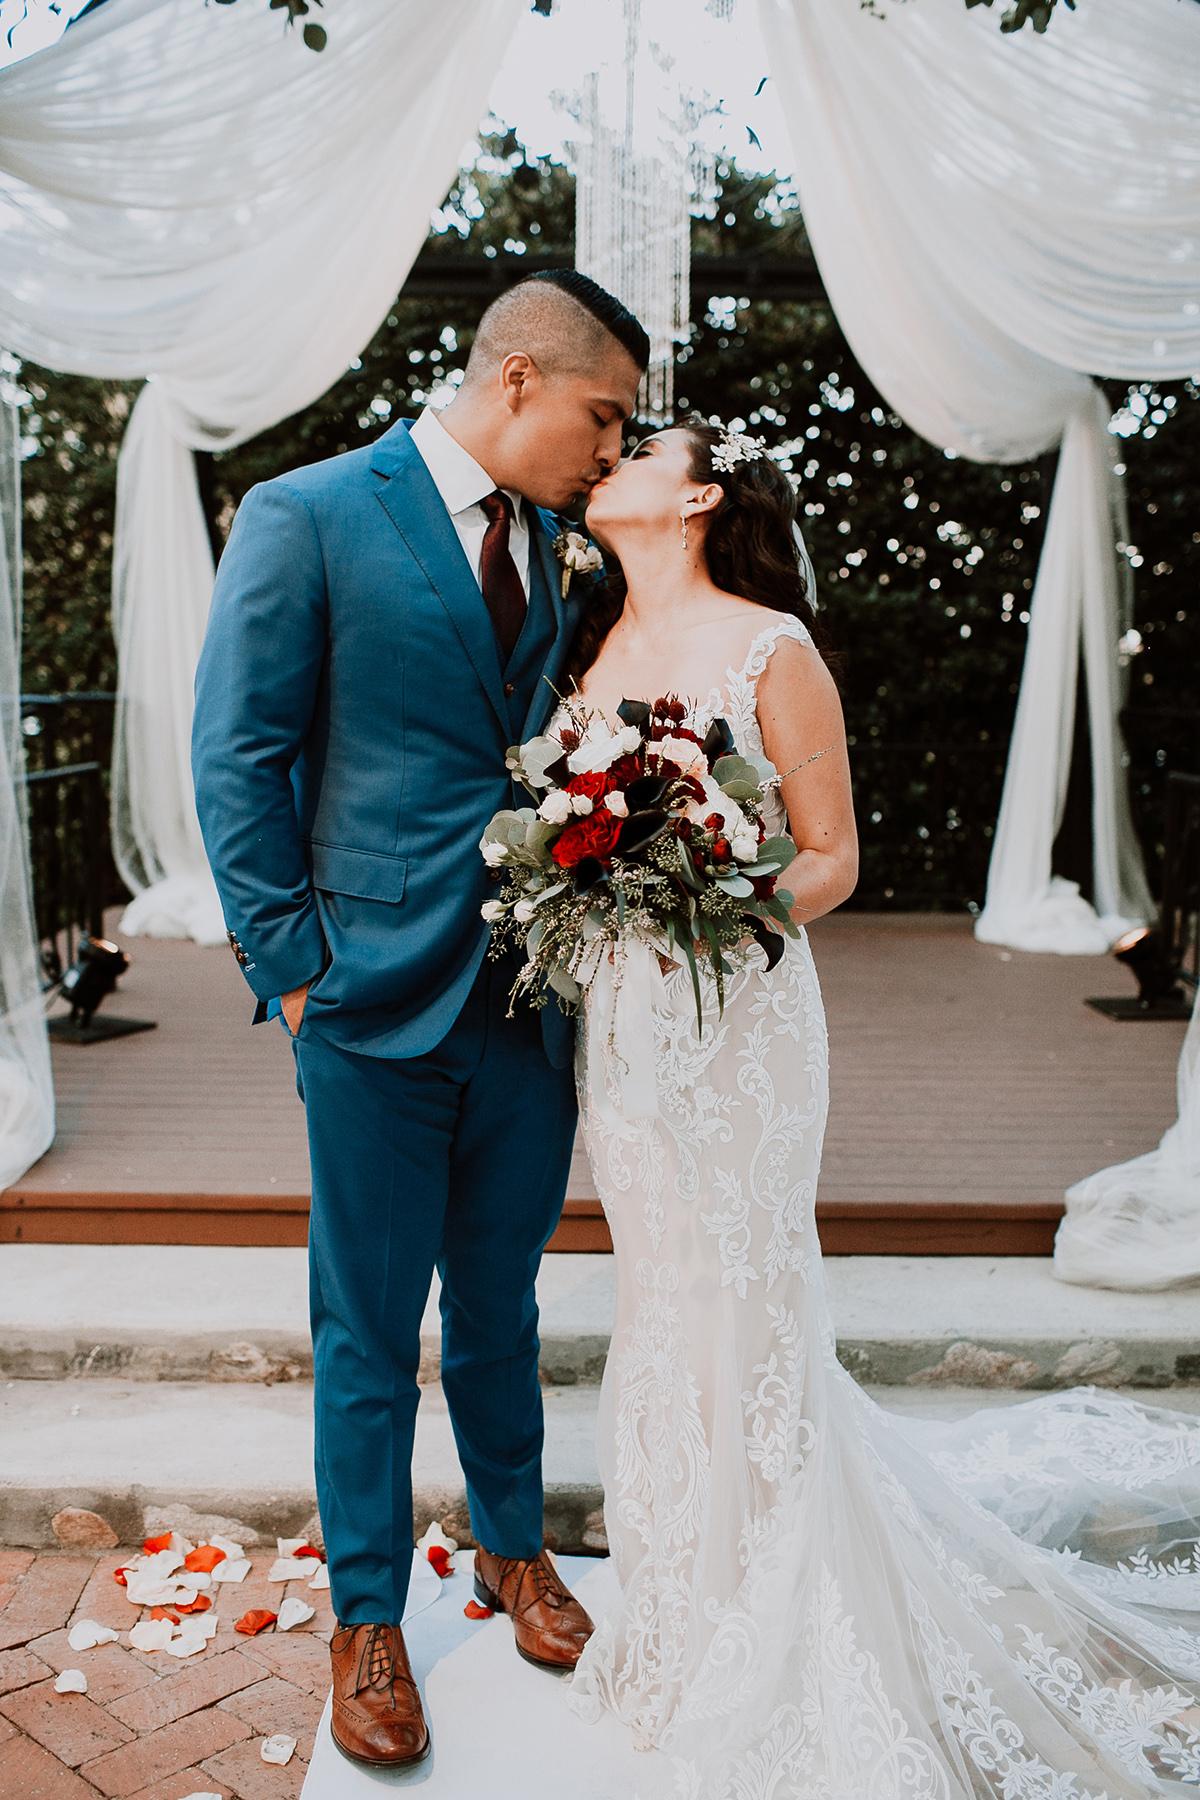 karla_tommy_wedding_048.jpg